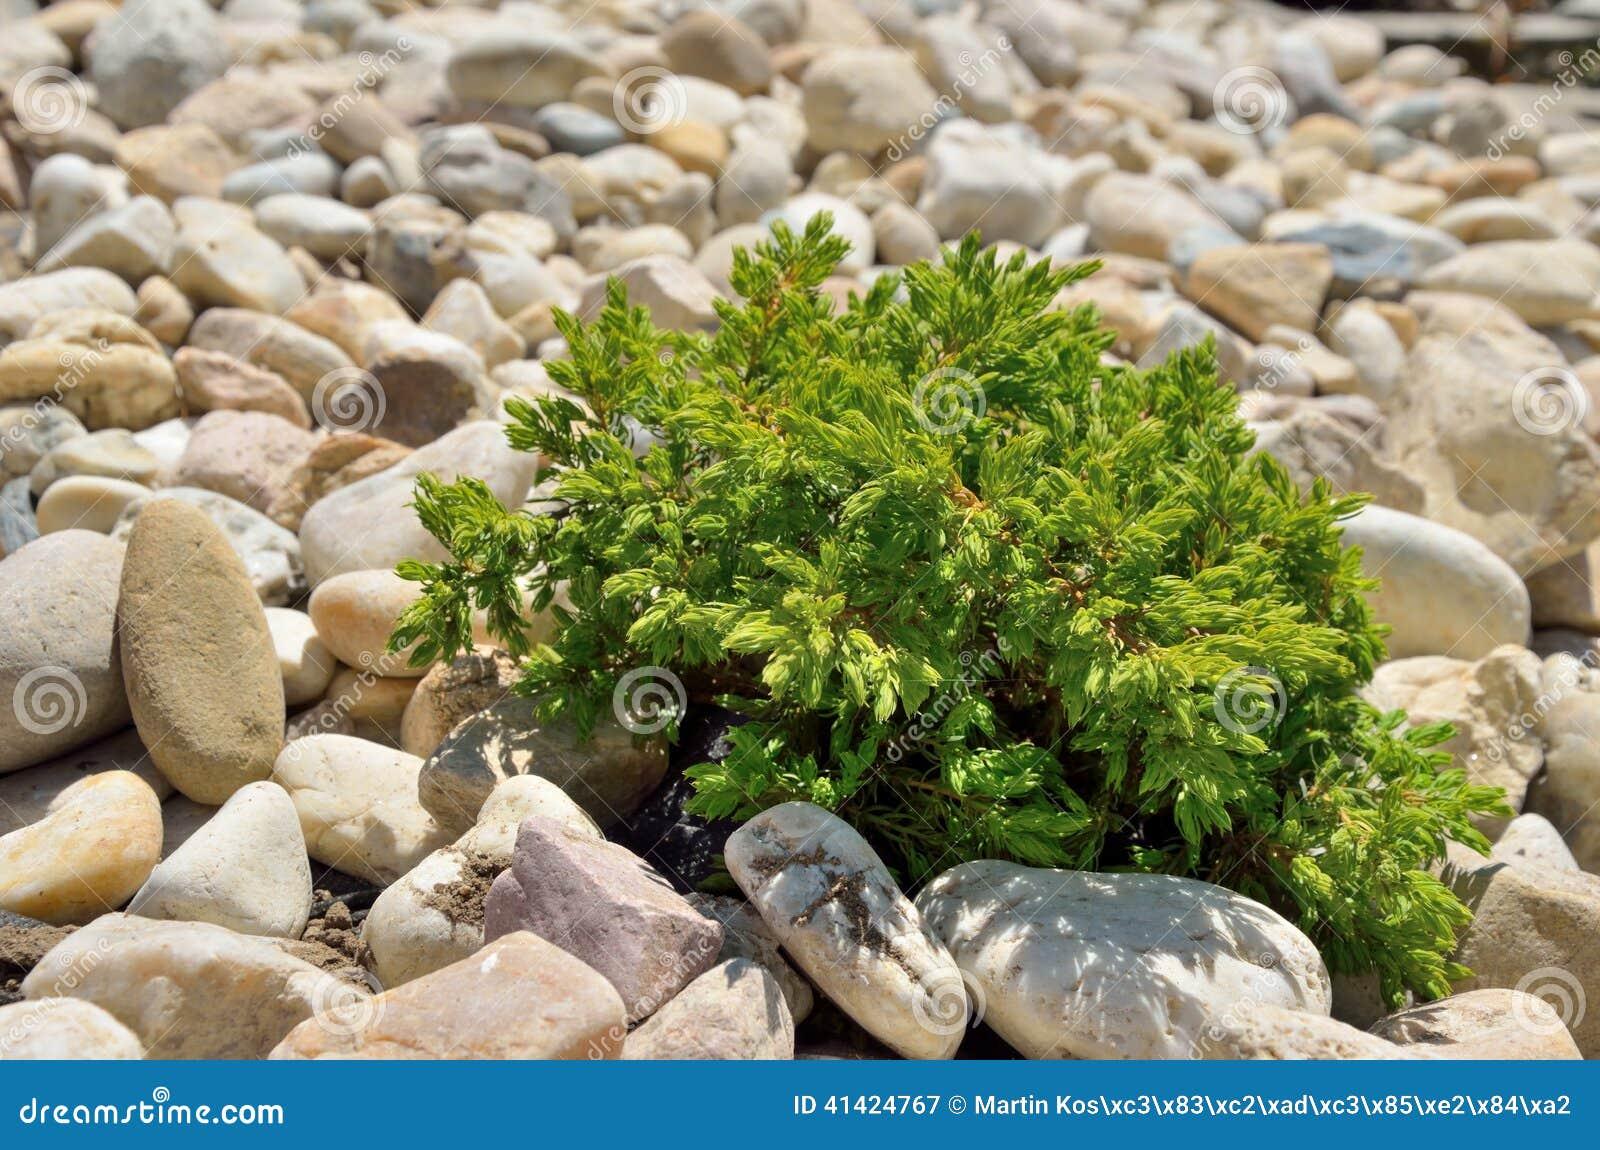 petit arbuste dans les pierres image stock image du fond rural 41424767. Black Bedroom Furniture Sets. Home Design Ideas